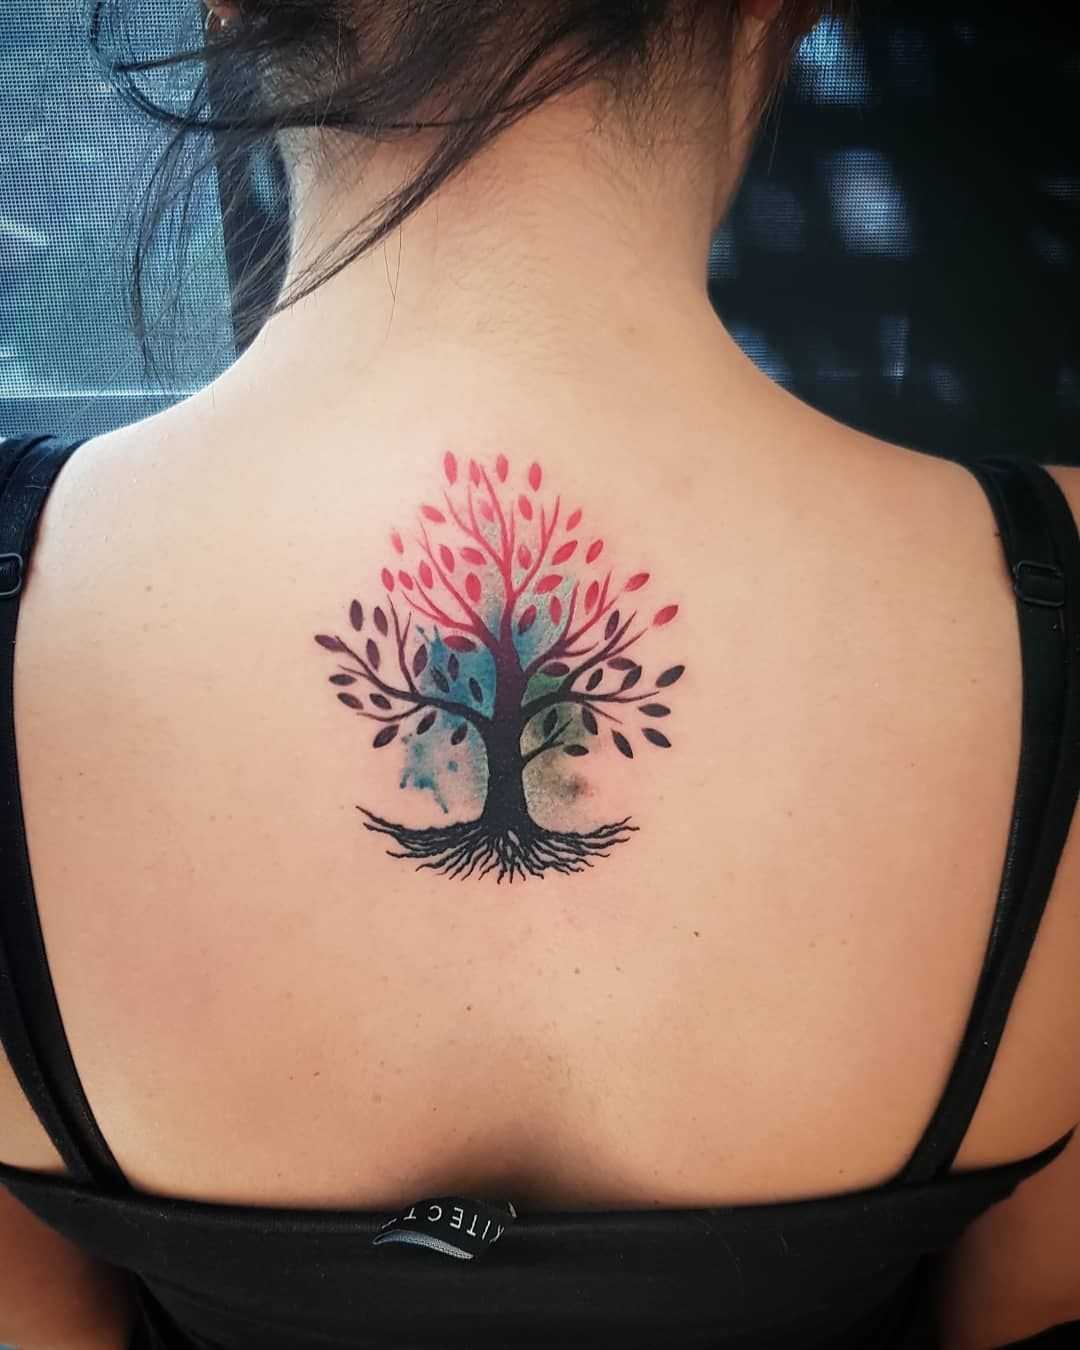 árbol De La Vida Tatuajes Tatuaje Arbol Tatuajes Tatuaje árbol